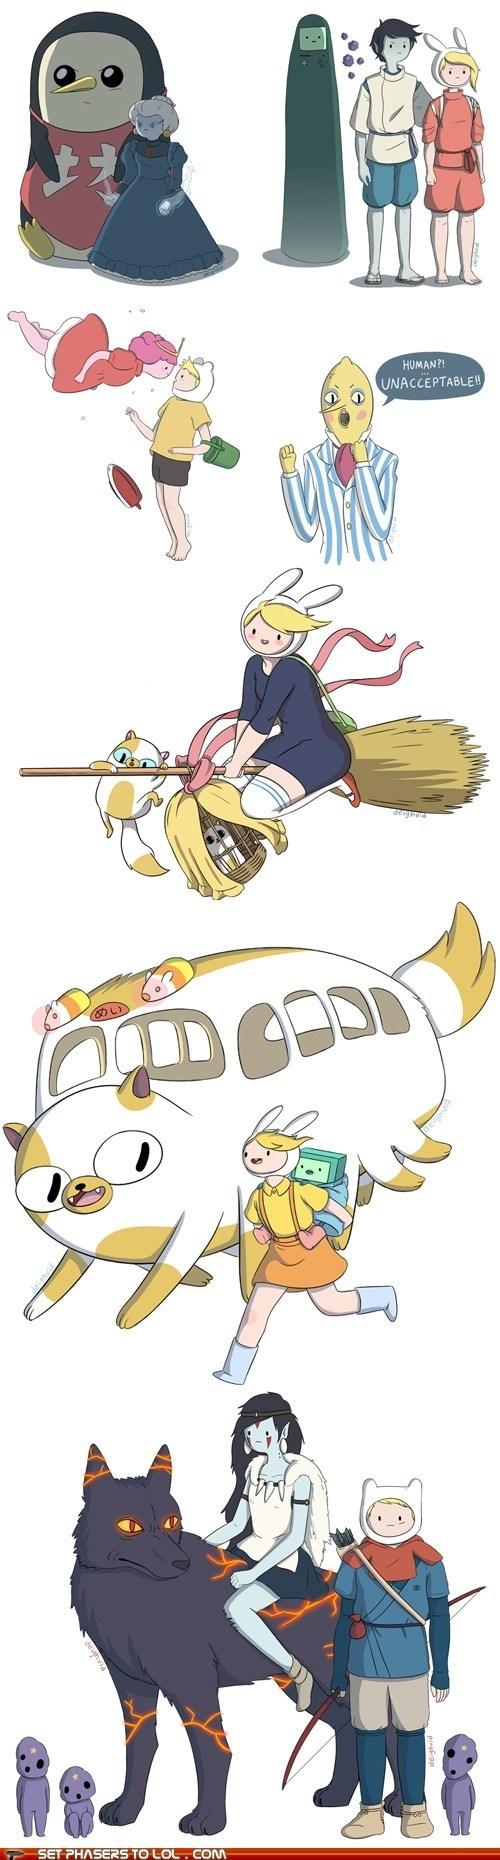 Studio Ghibli's Adventure Time